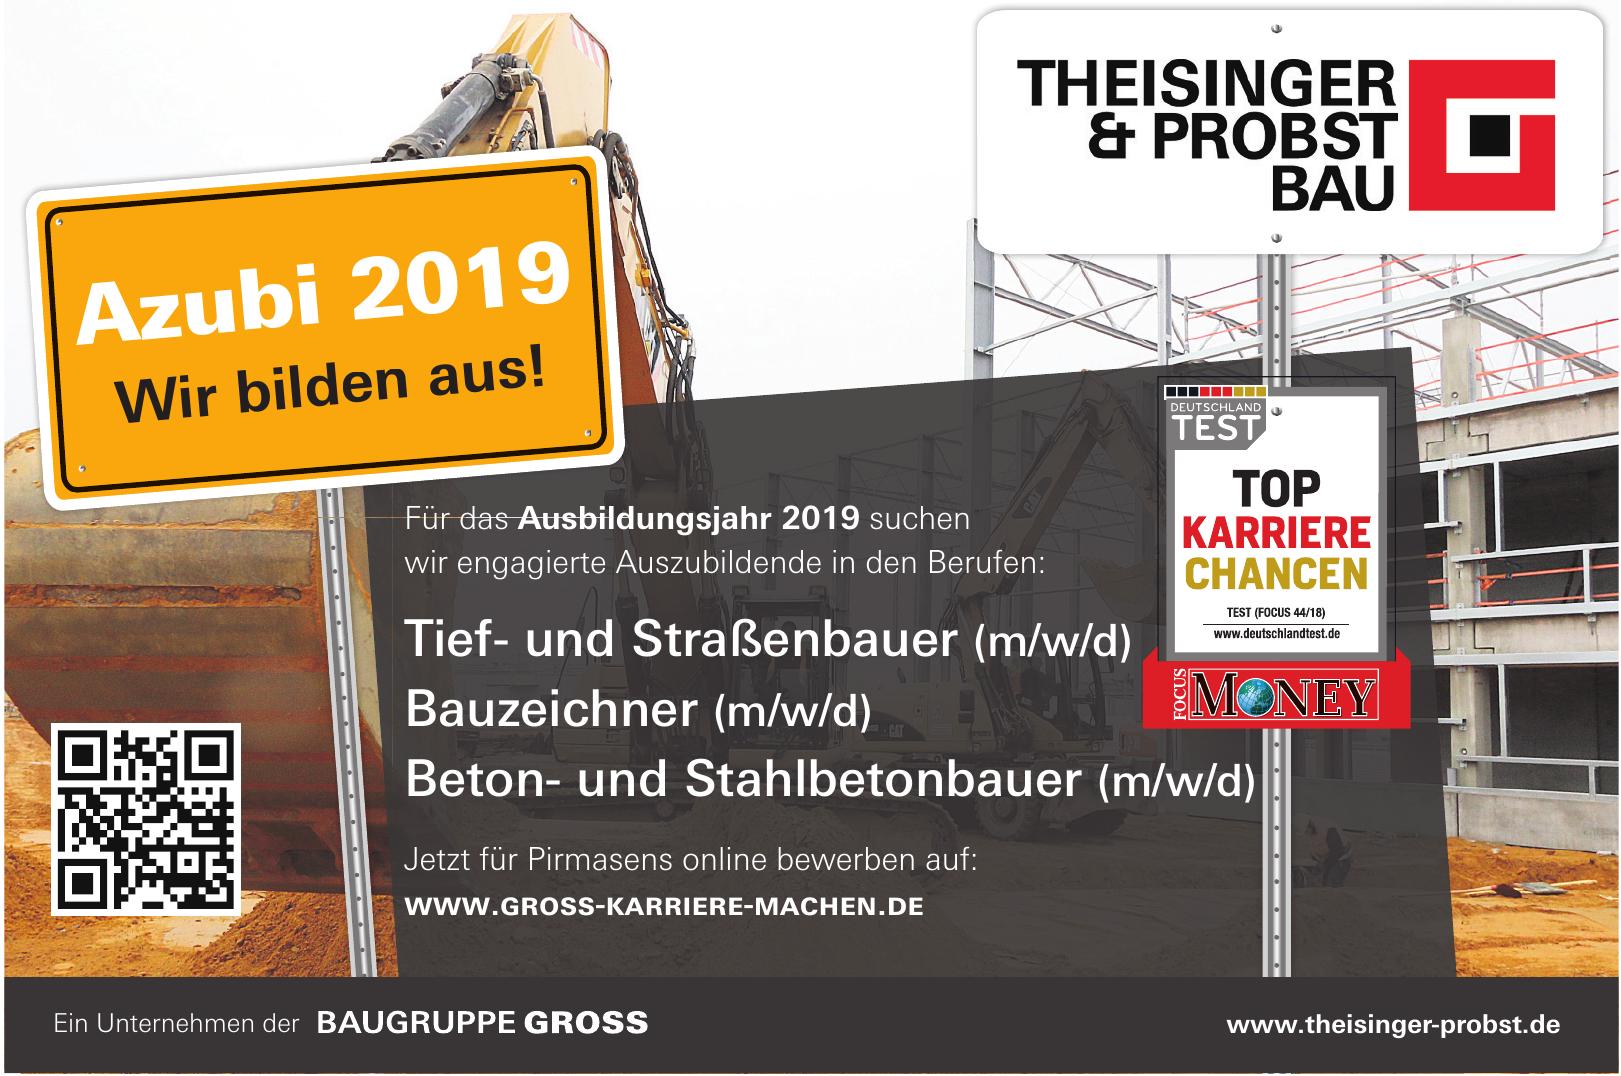 Theisinger & Probst Bau GmbH